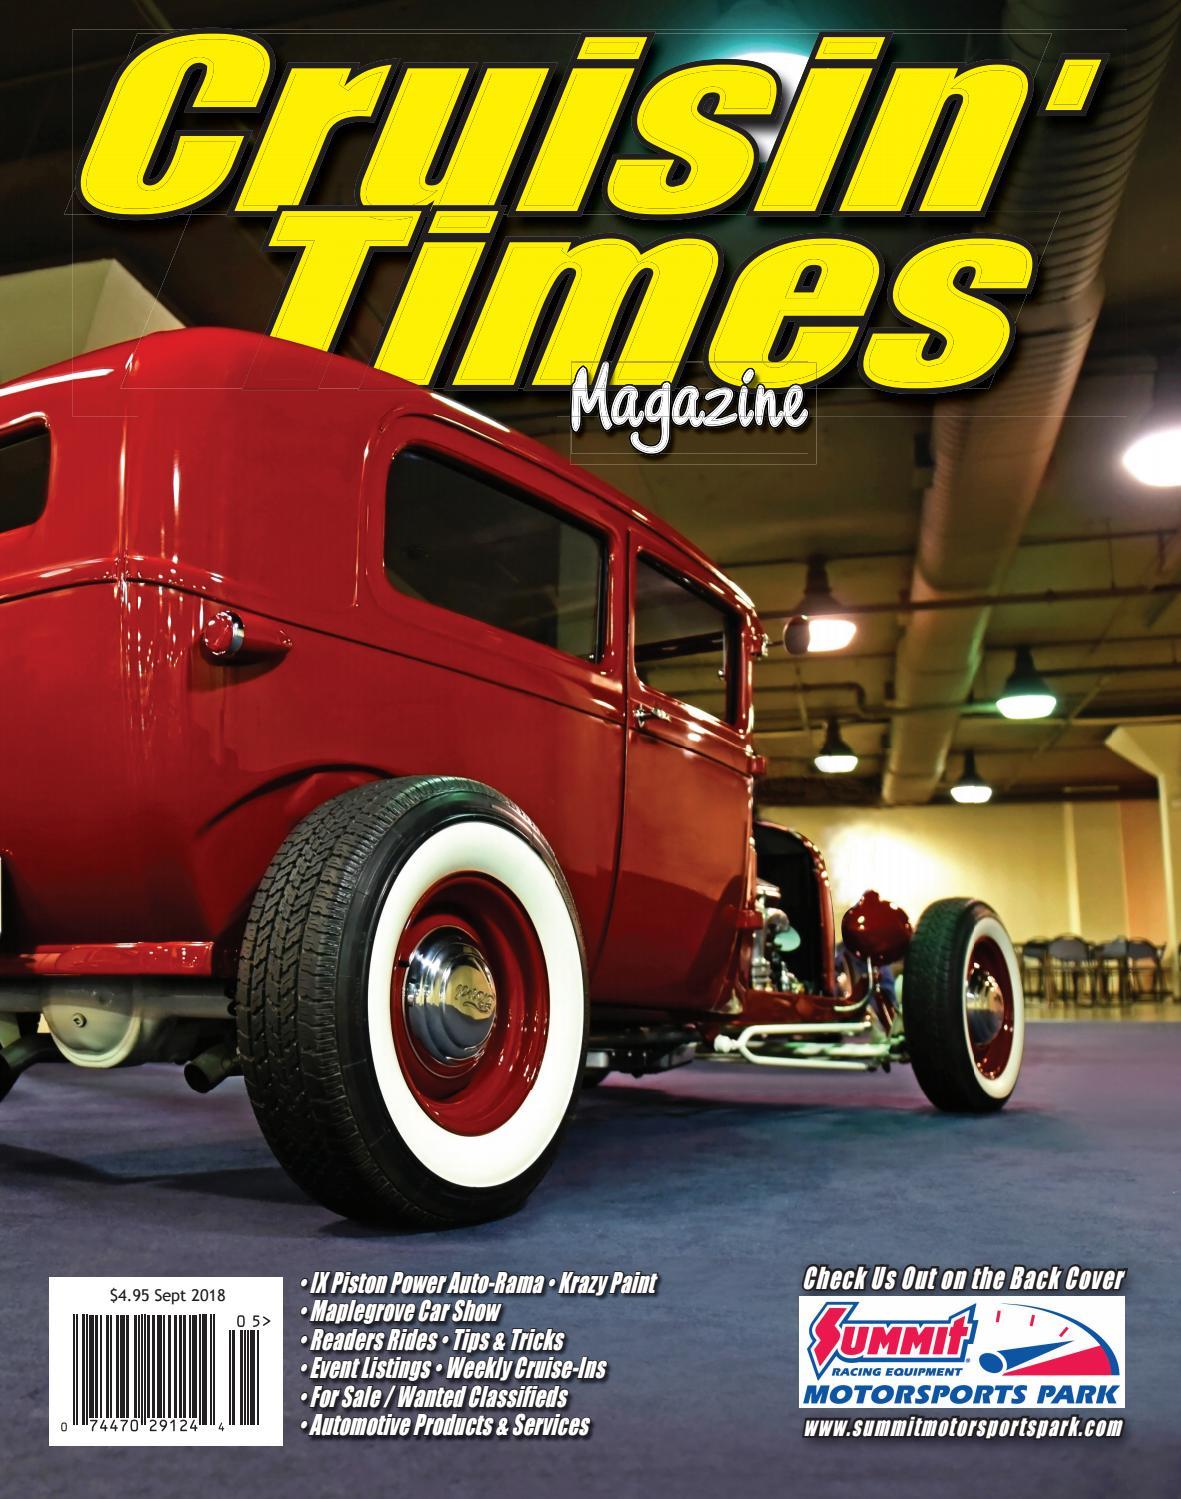 ff927dddb00 Cruisin Times Magazine - September 2018 Issue by Cruisin' Times Magazine -  issuu